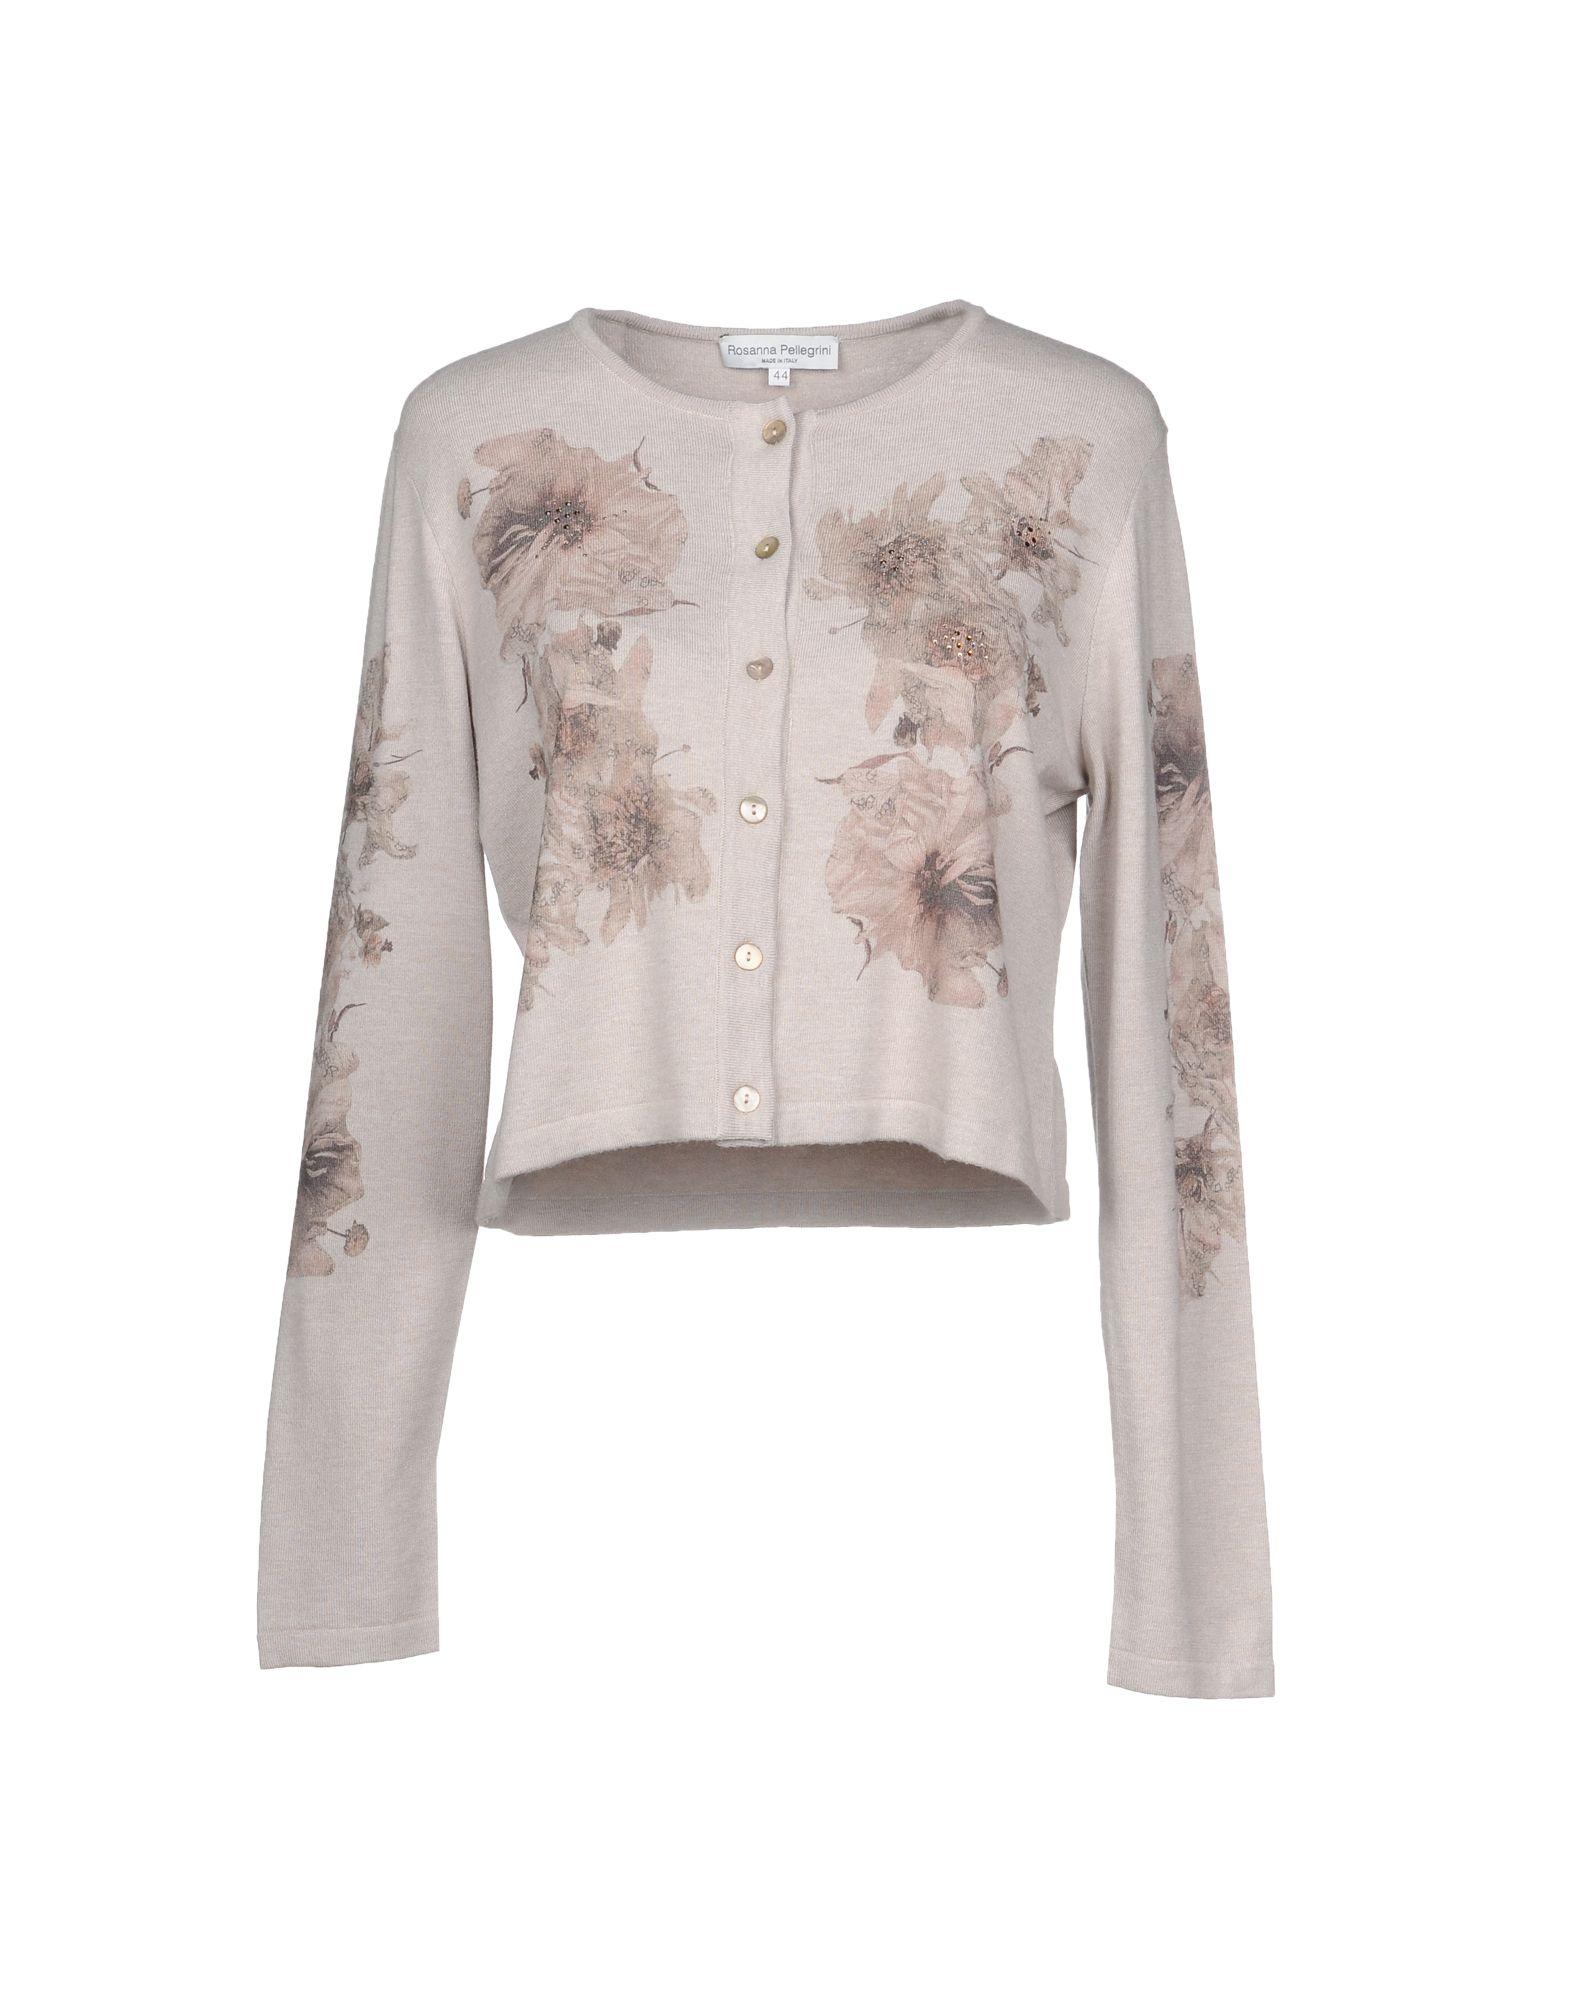 ROSANNA PELLEGRINI Кардиган блуза rosanna pellegrini блузы в горошек